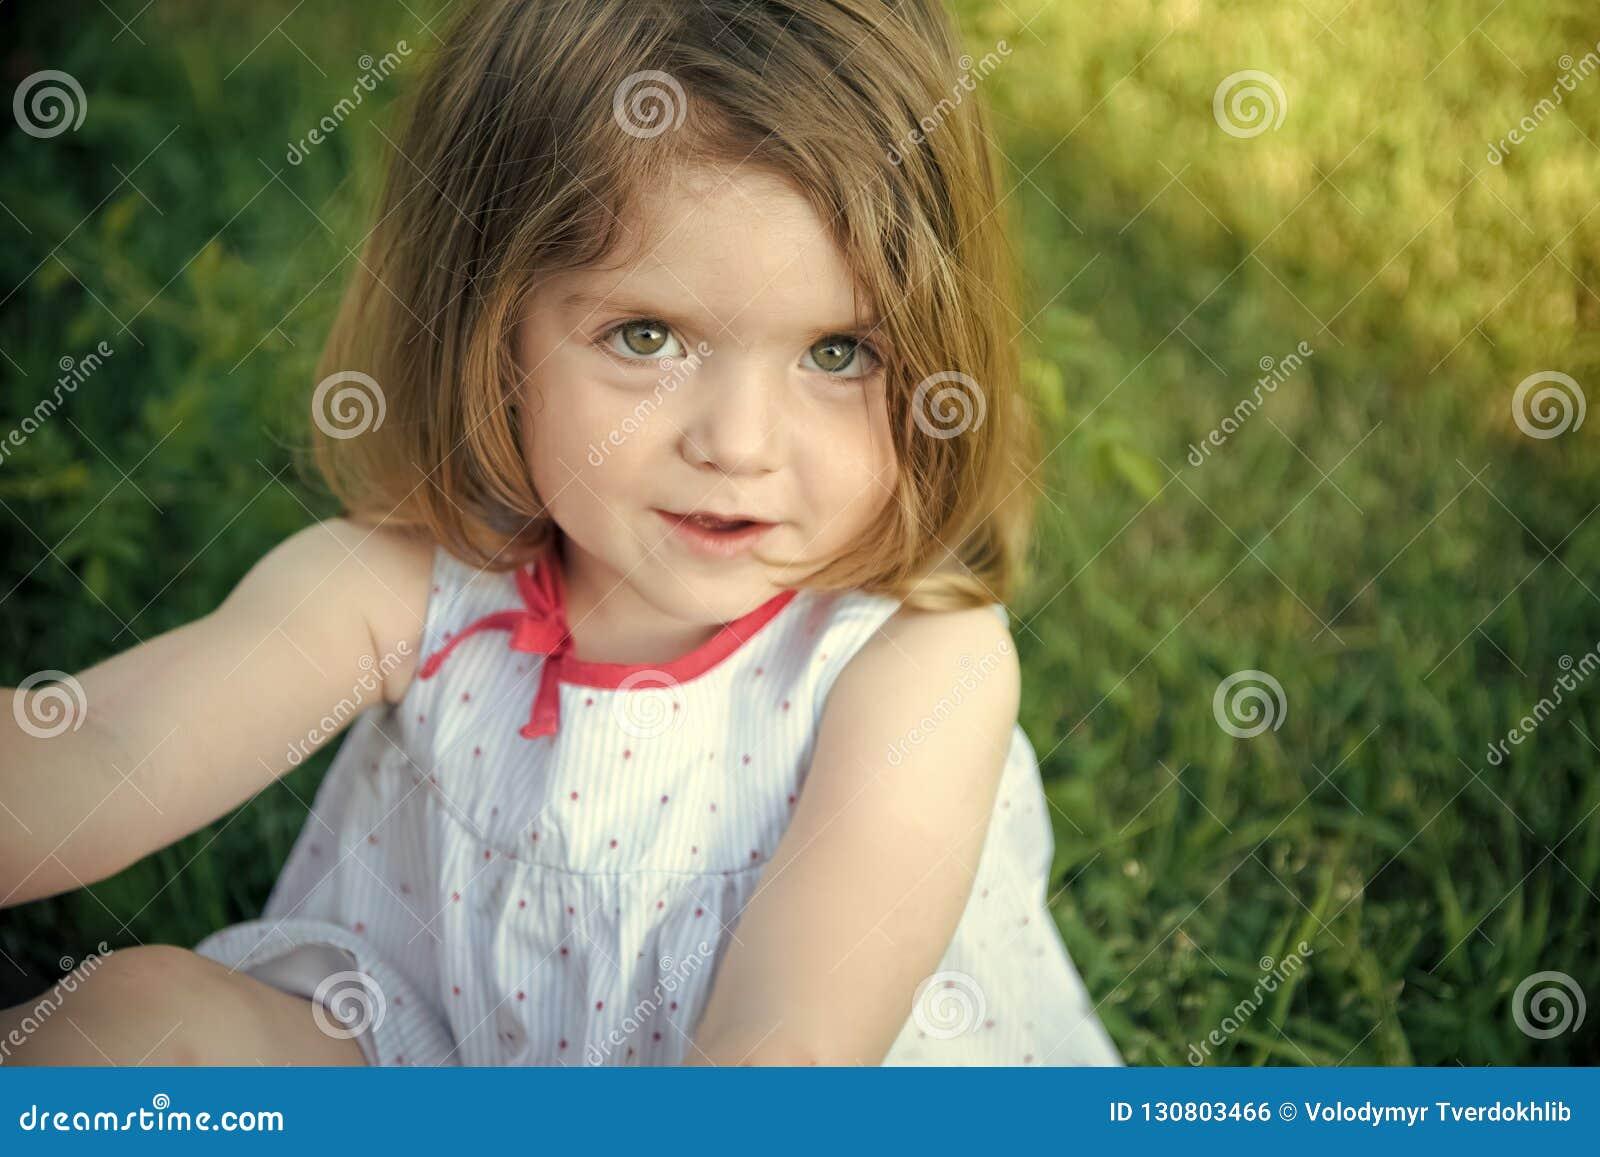 8,8 Baby Girl Brown Eyes Photos - Free & Royalty-Free Stock